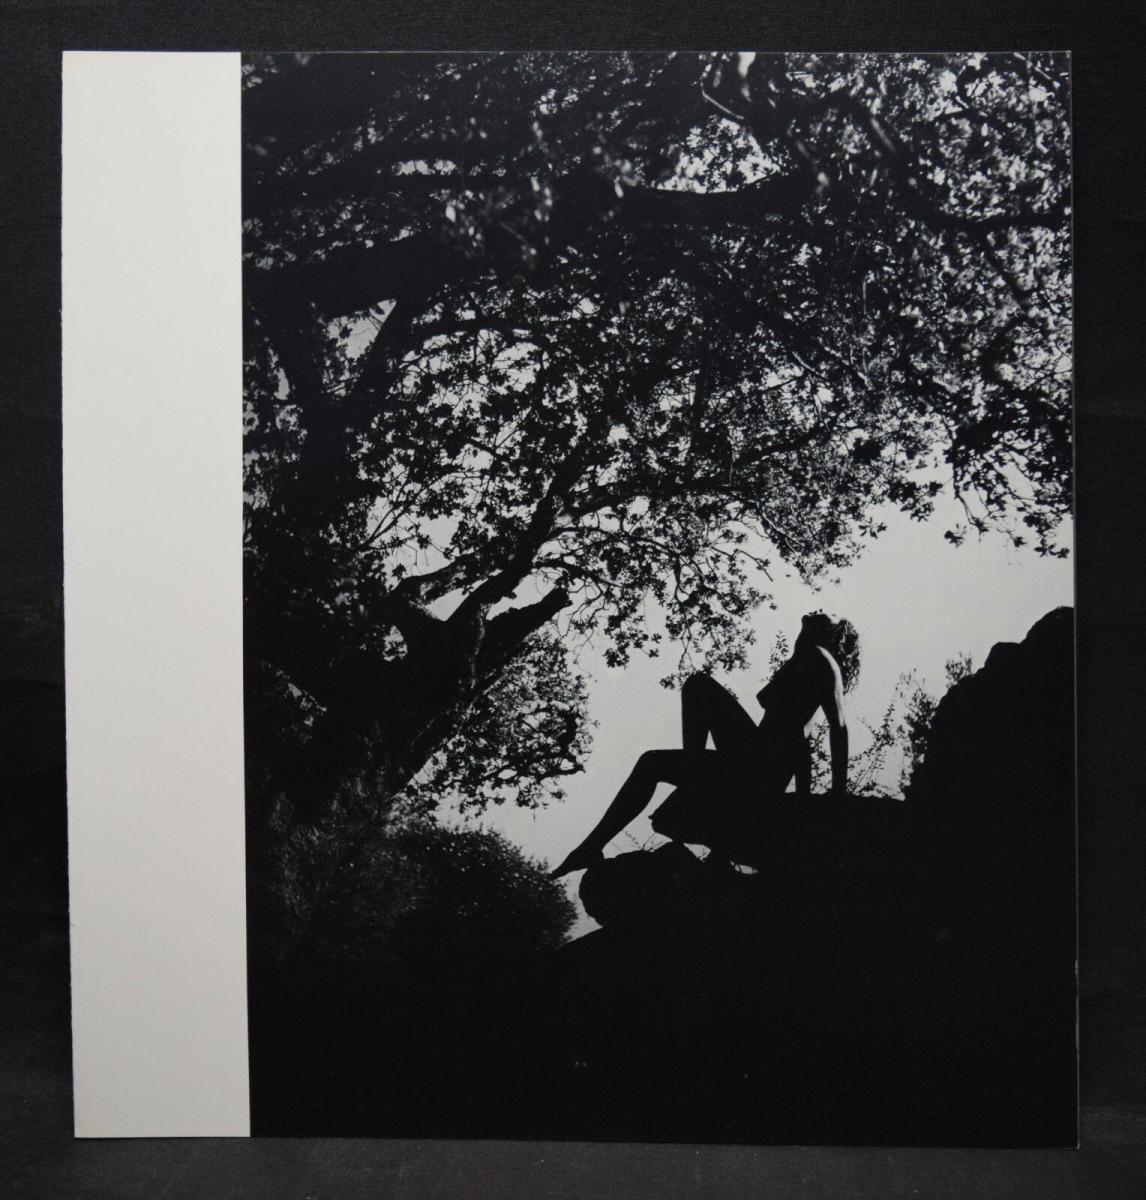 ANDRÉ KRETZ - CANTATE A NAUSICAA - WIDMUNG - ORIGINALZEICHNUNG - 1980 - FOTOS 6